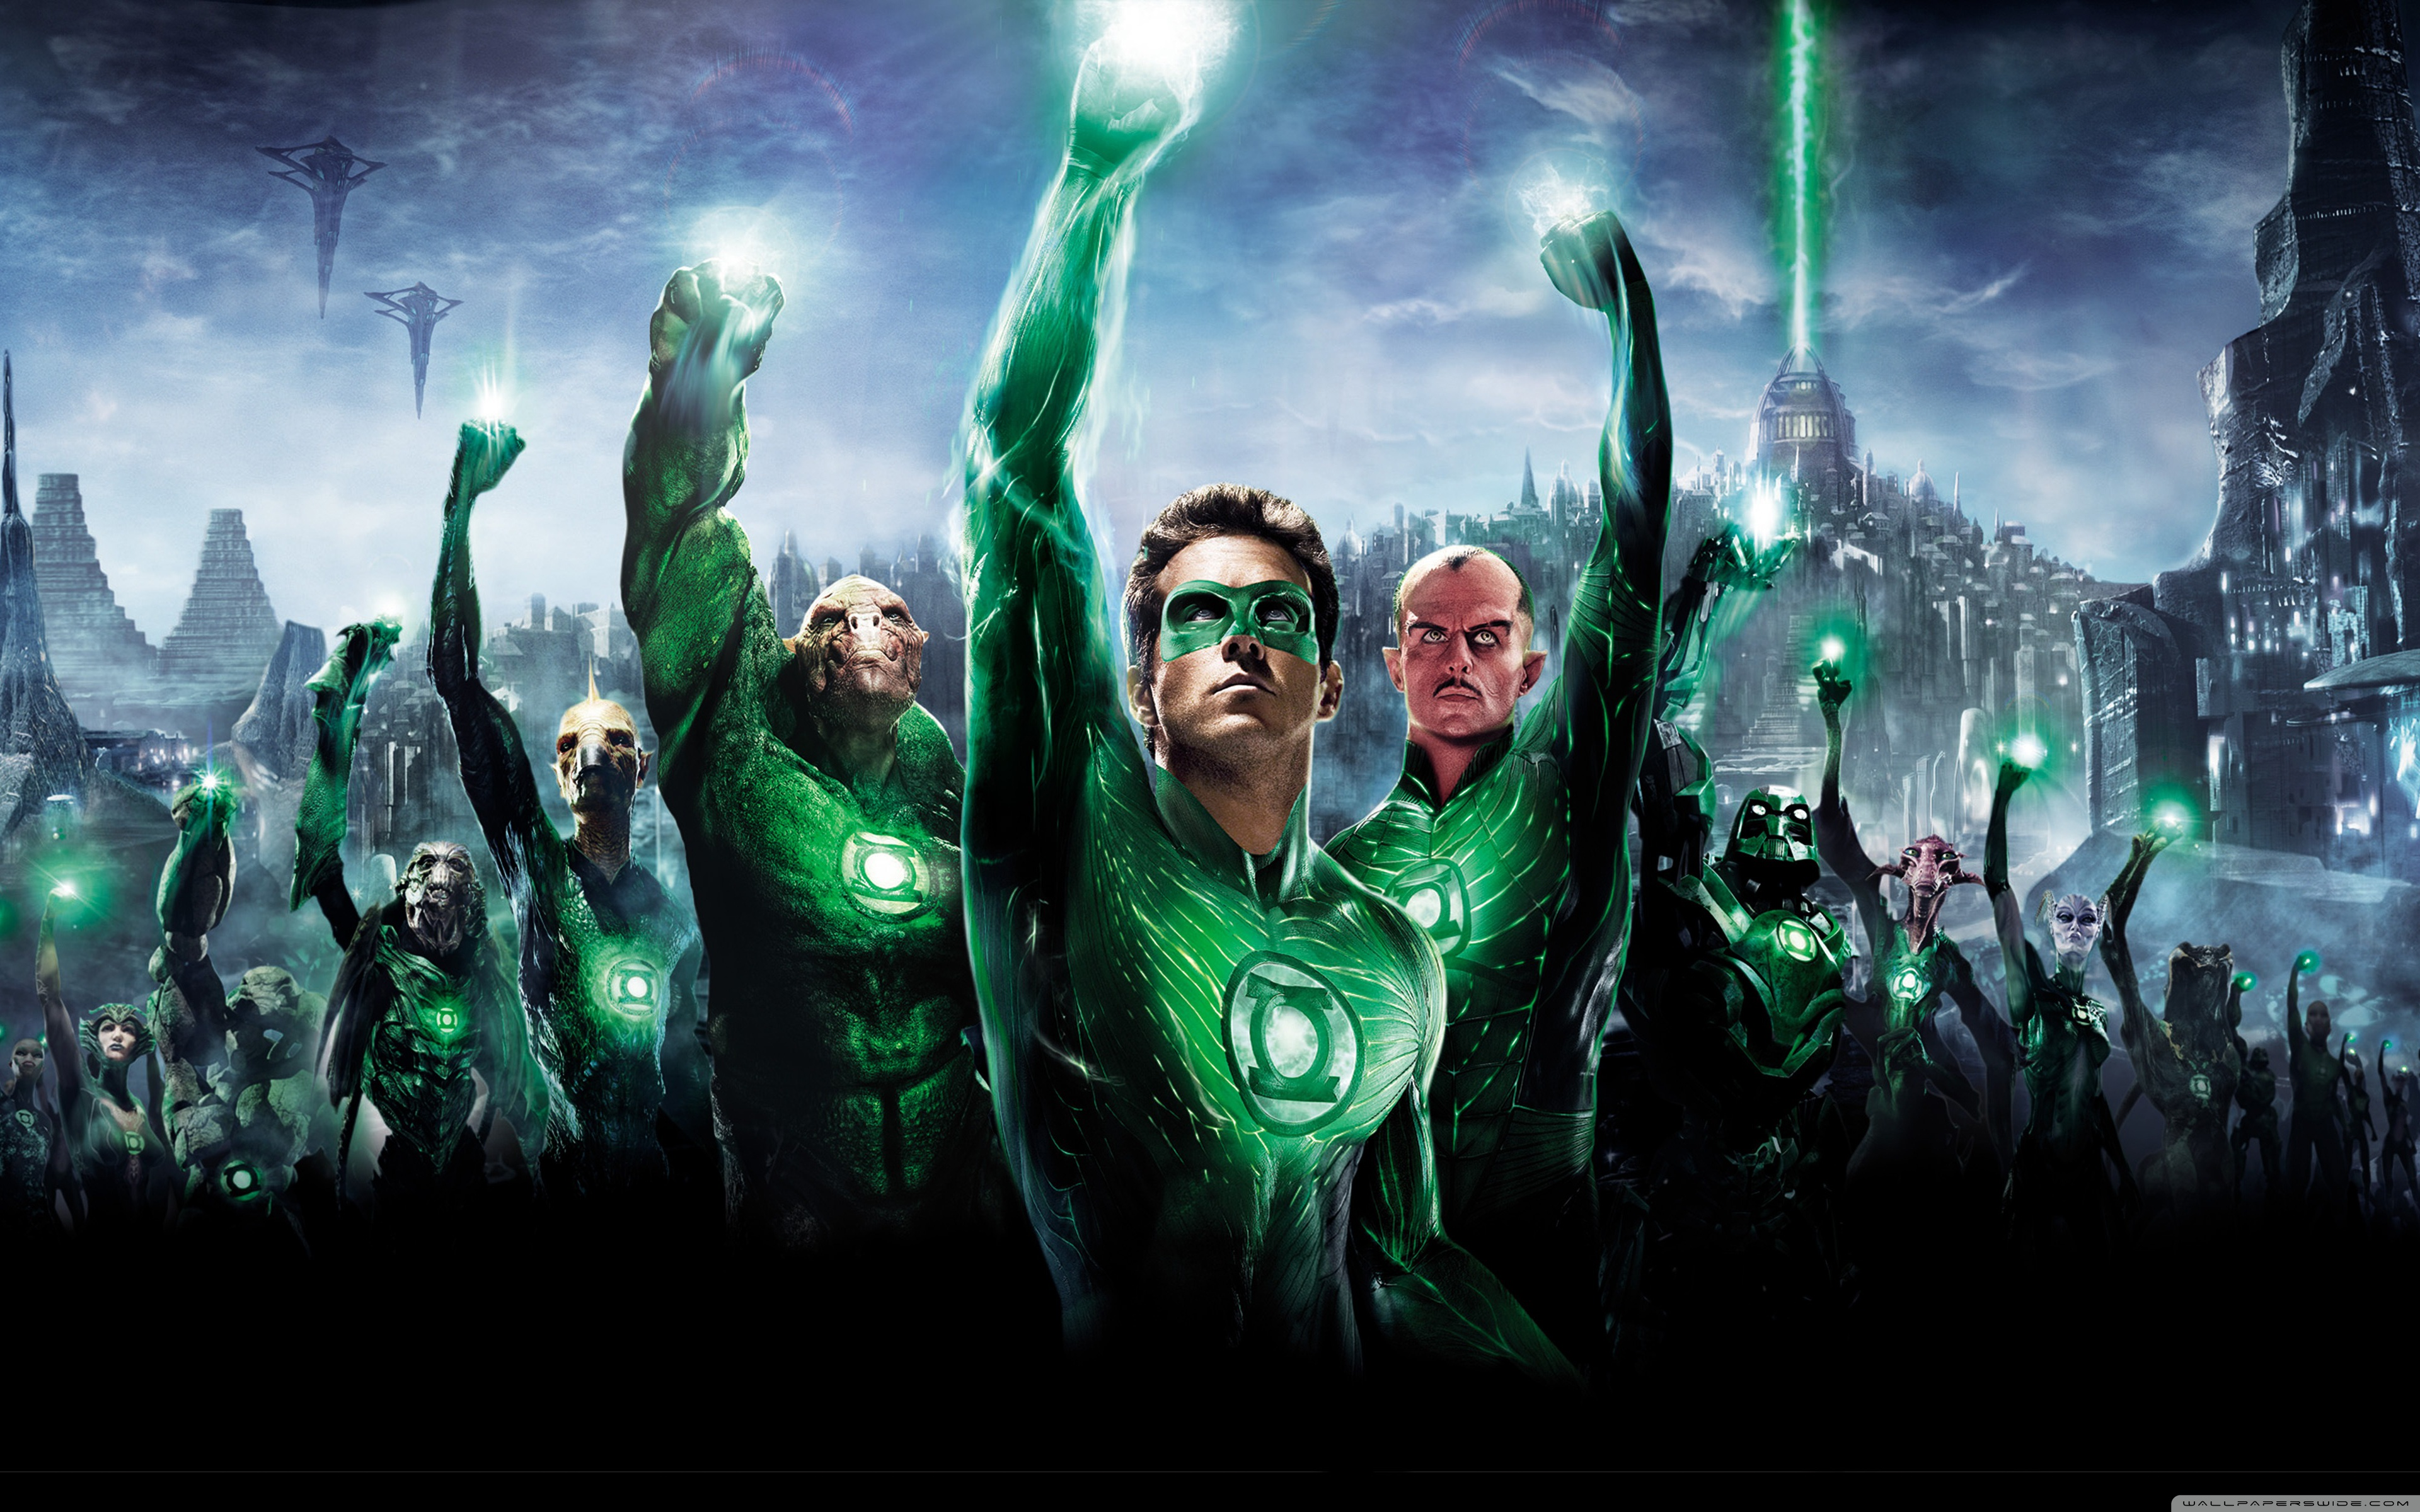 Green Lantern Movie 2011 4K HD Desktop Wallpaper for 4K Ultra 3840x2400